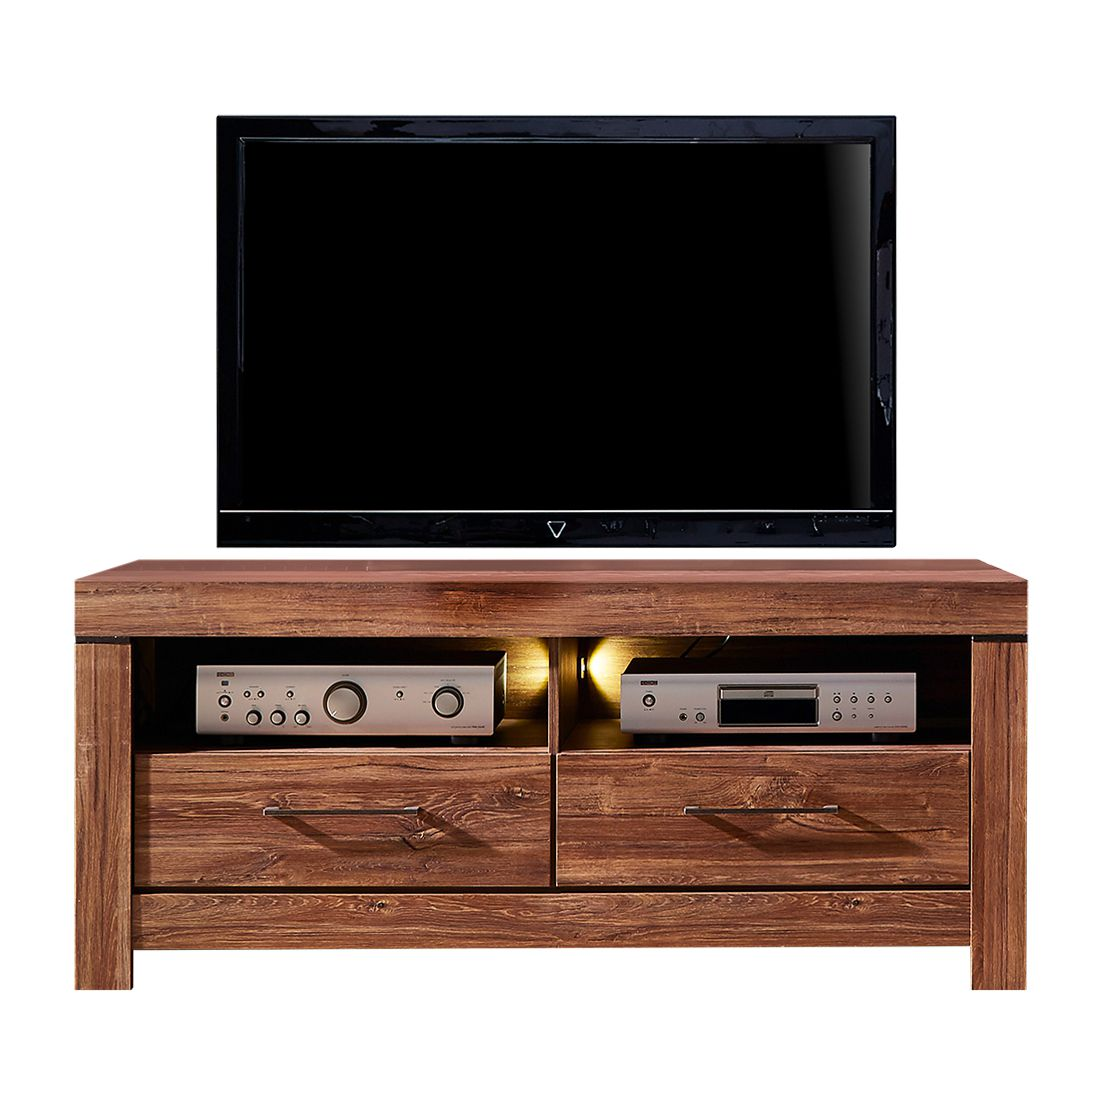 EEK A+, Meuble TV Blairmore (éclairage fourni) - Imitation acacia - 138 cm, loftscape